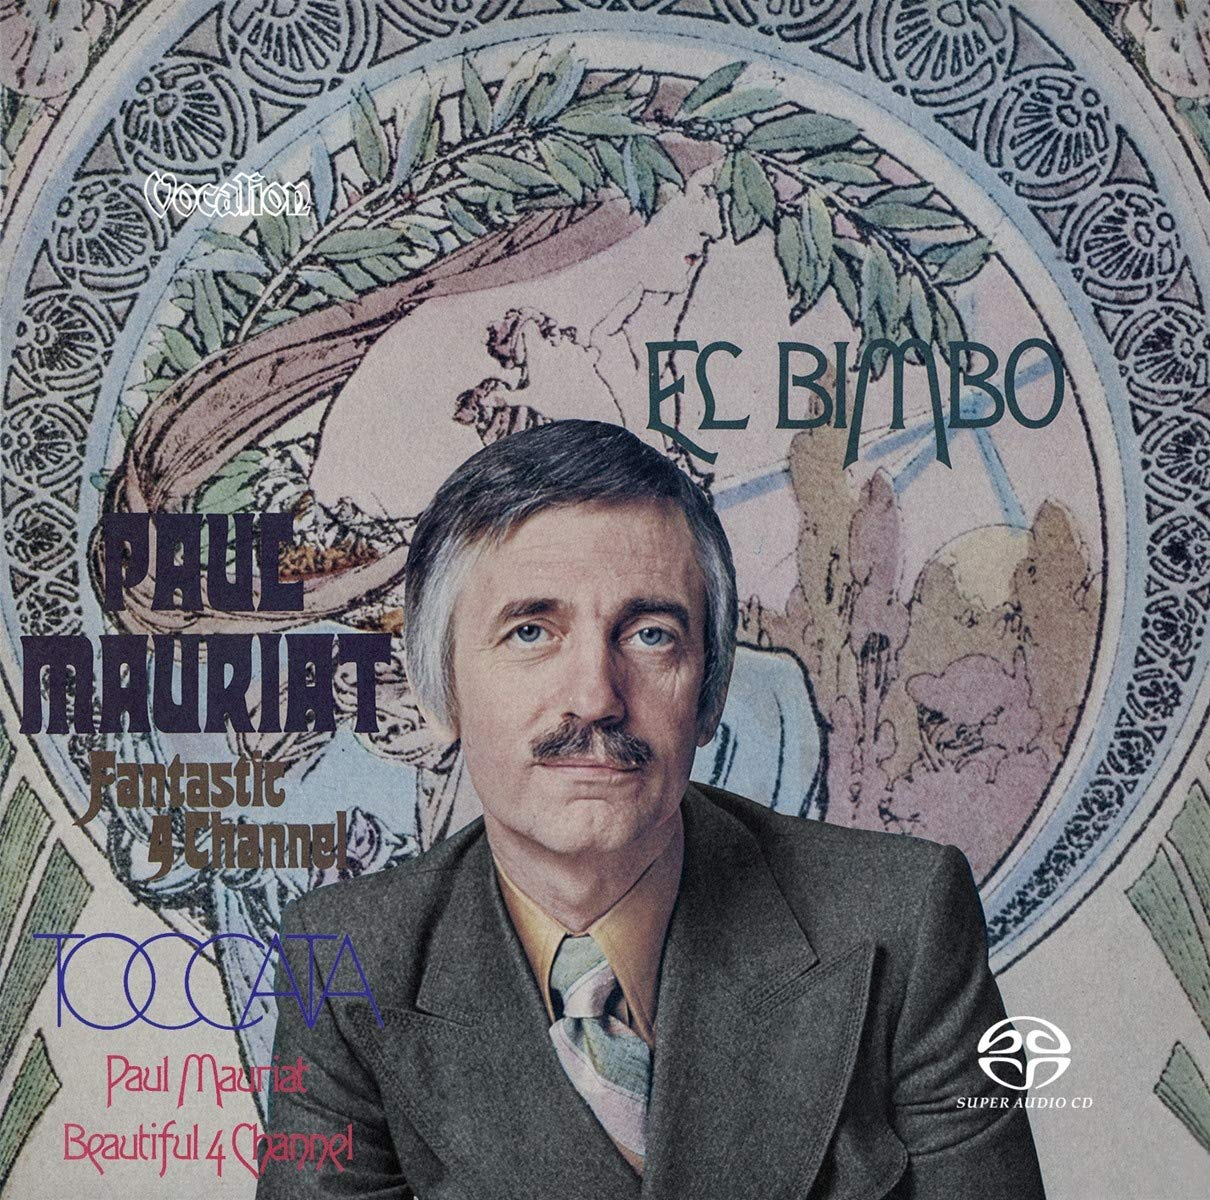 SACD : Paul Mauriat - El Bimbo & Toccata (Limited Edition, Hybrid SACD, Multichannel/Stereo SACD, Asia - Import)